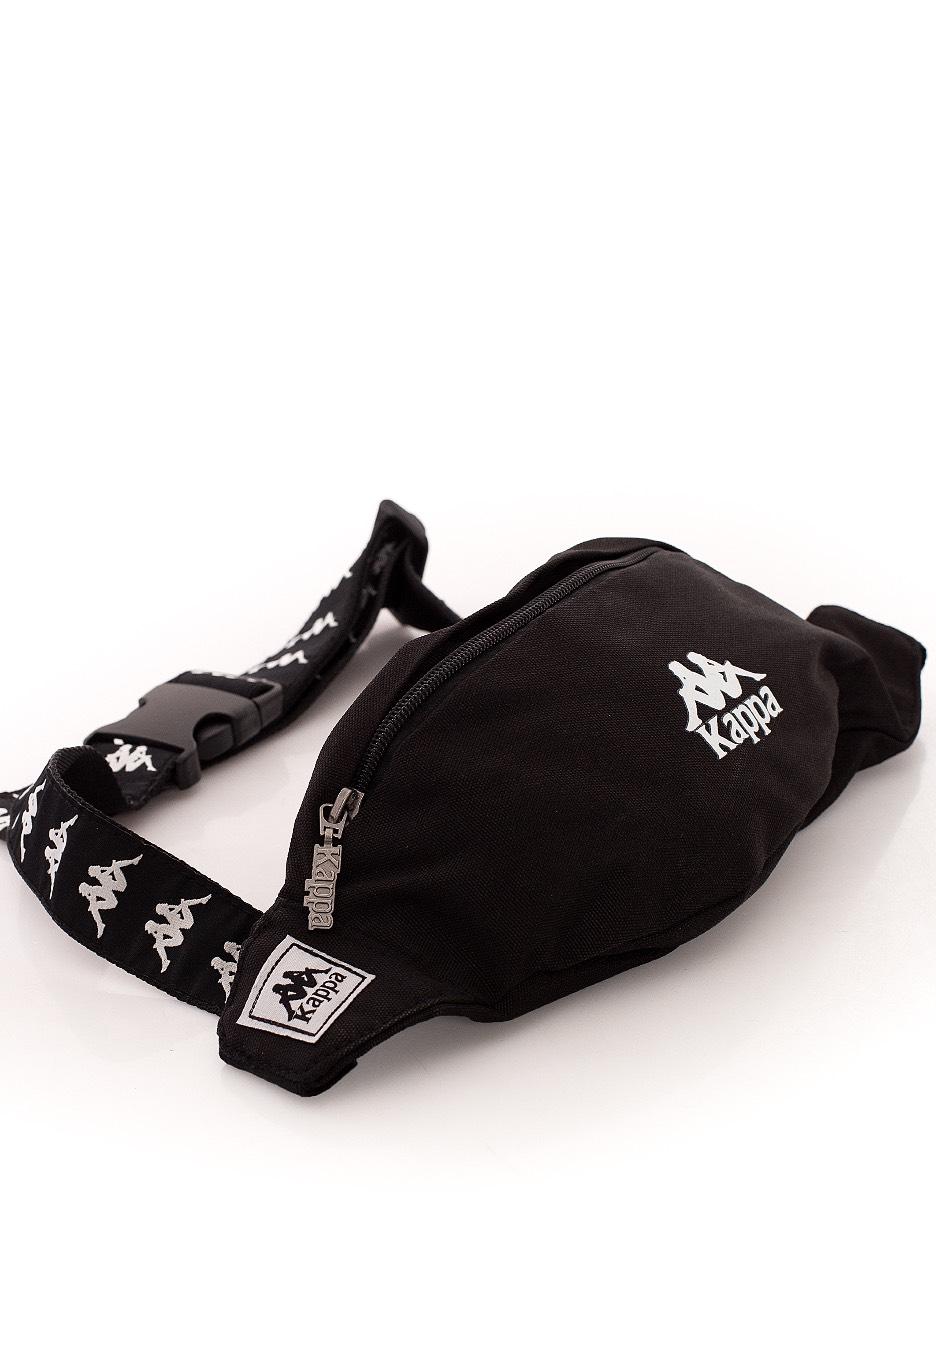 Arne cartel formato  Kappa - Edion Black - Hip Bag - Impericon.com Worldwide